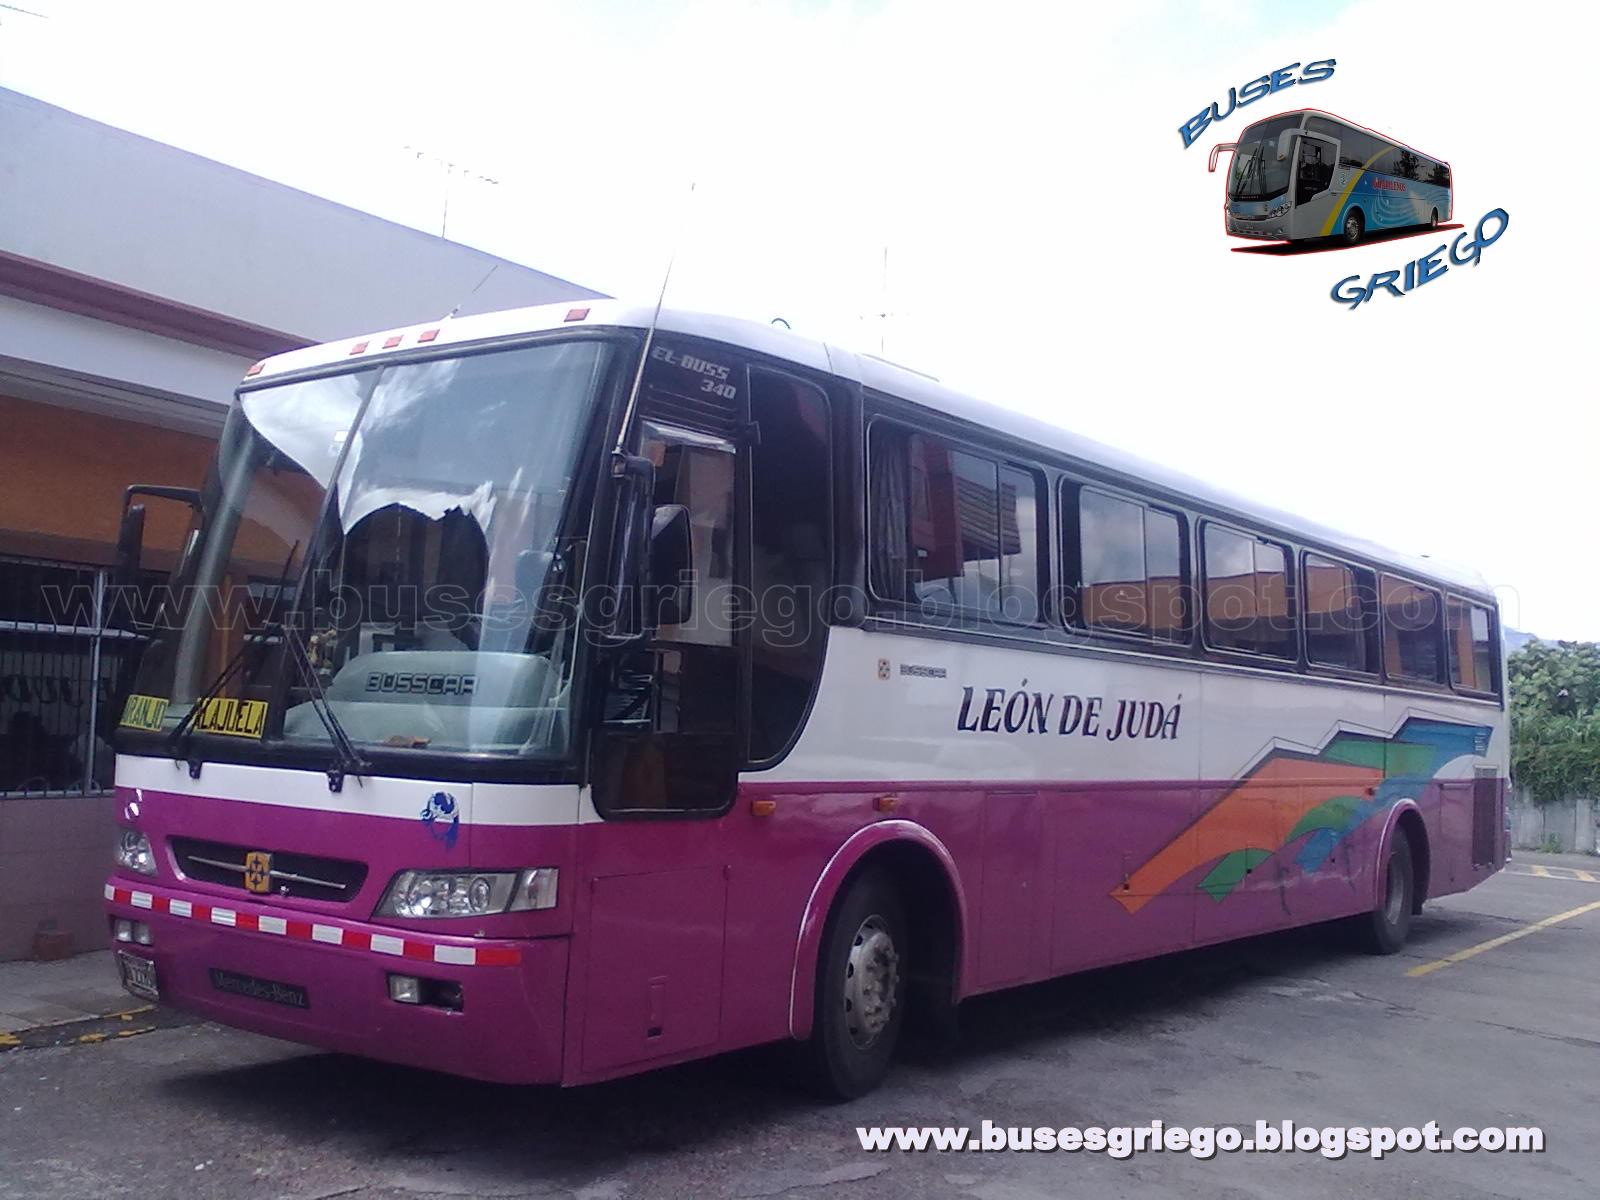 Buses griego galeria 16 31 10 10 for Mercedes benz san jose